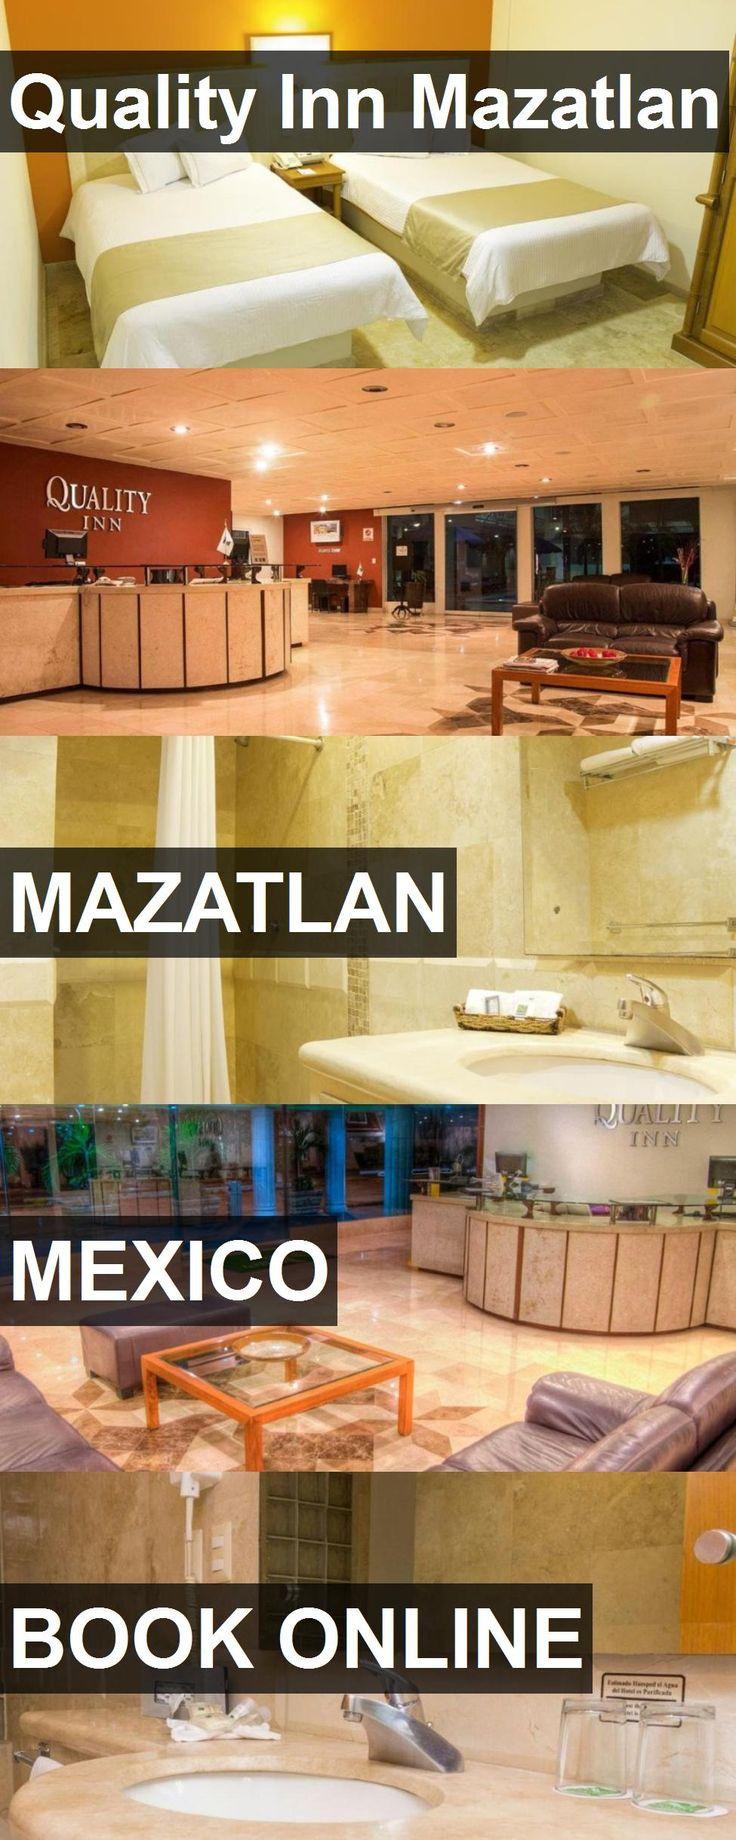 Hotel Quality Inn Mazatlan in Mazatlan, Mexico. For more information, photos, reviews and best prices please follow the link. #Mexico #Mazatlan #QualityInnMazatlan #hotel #travel #vacation